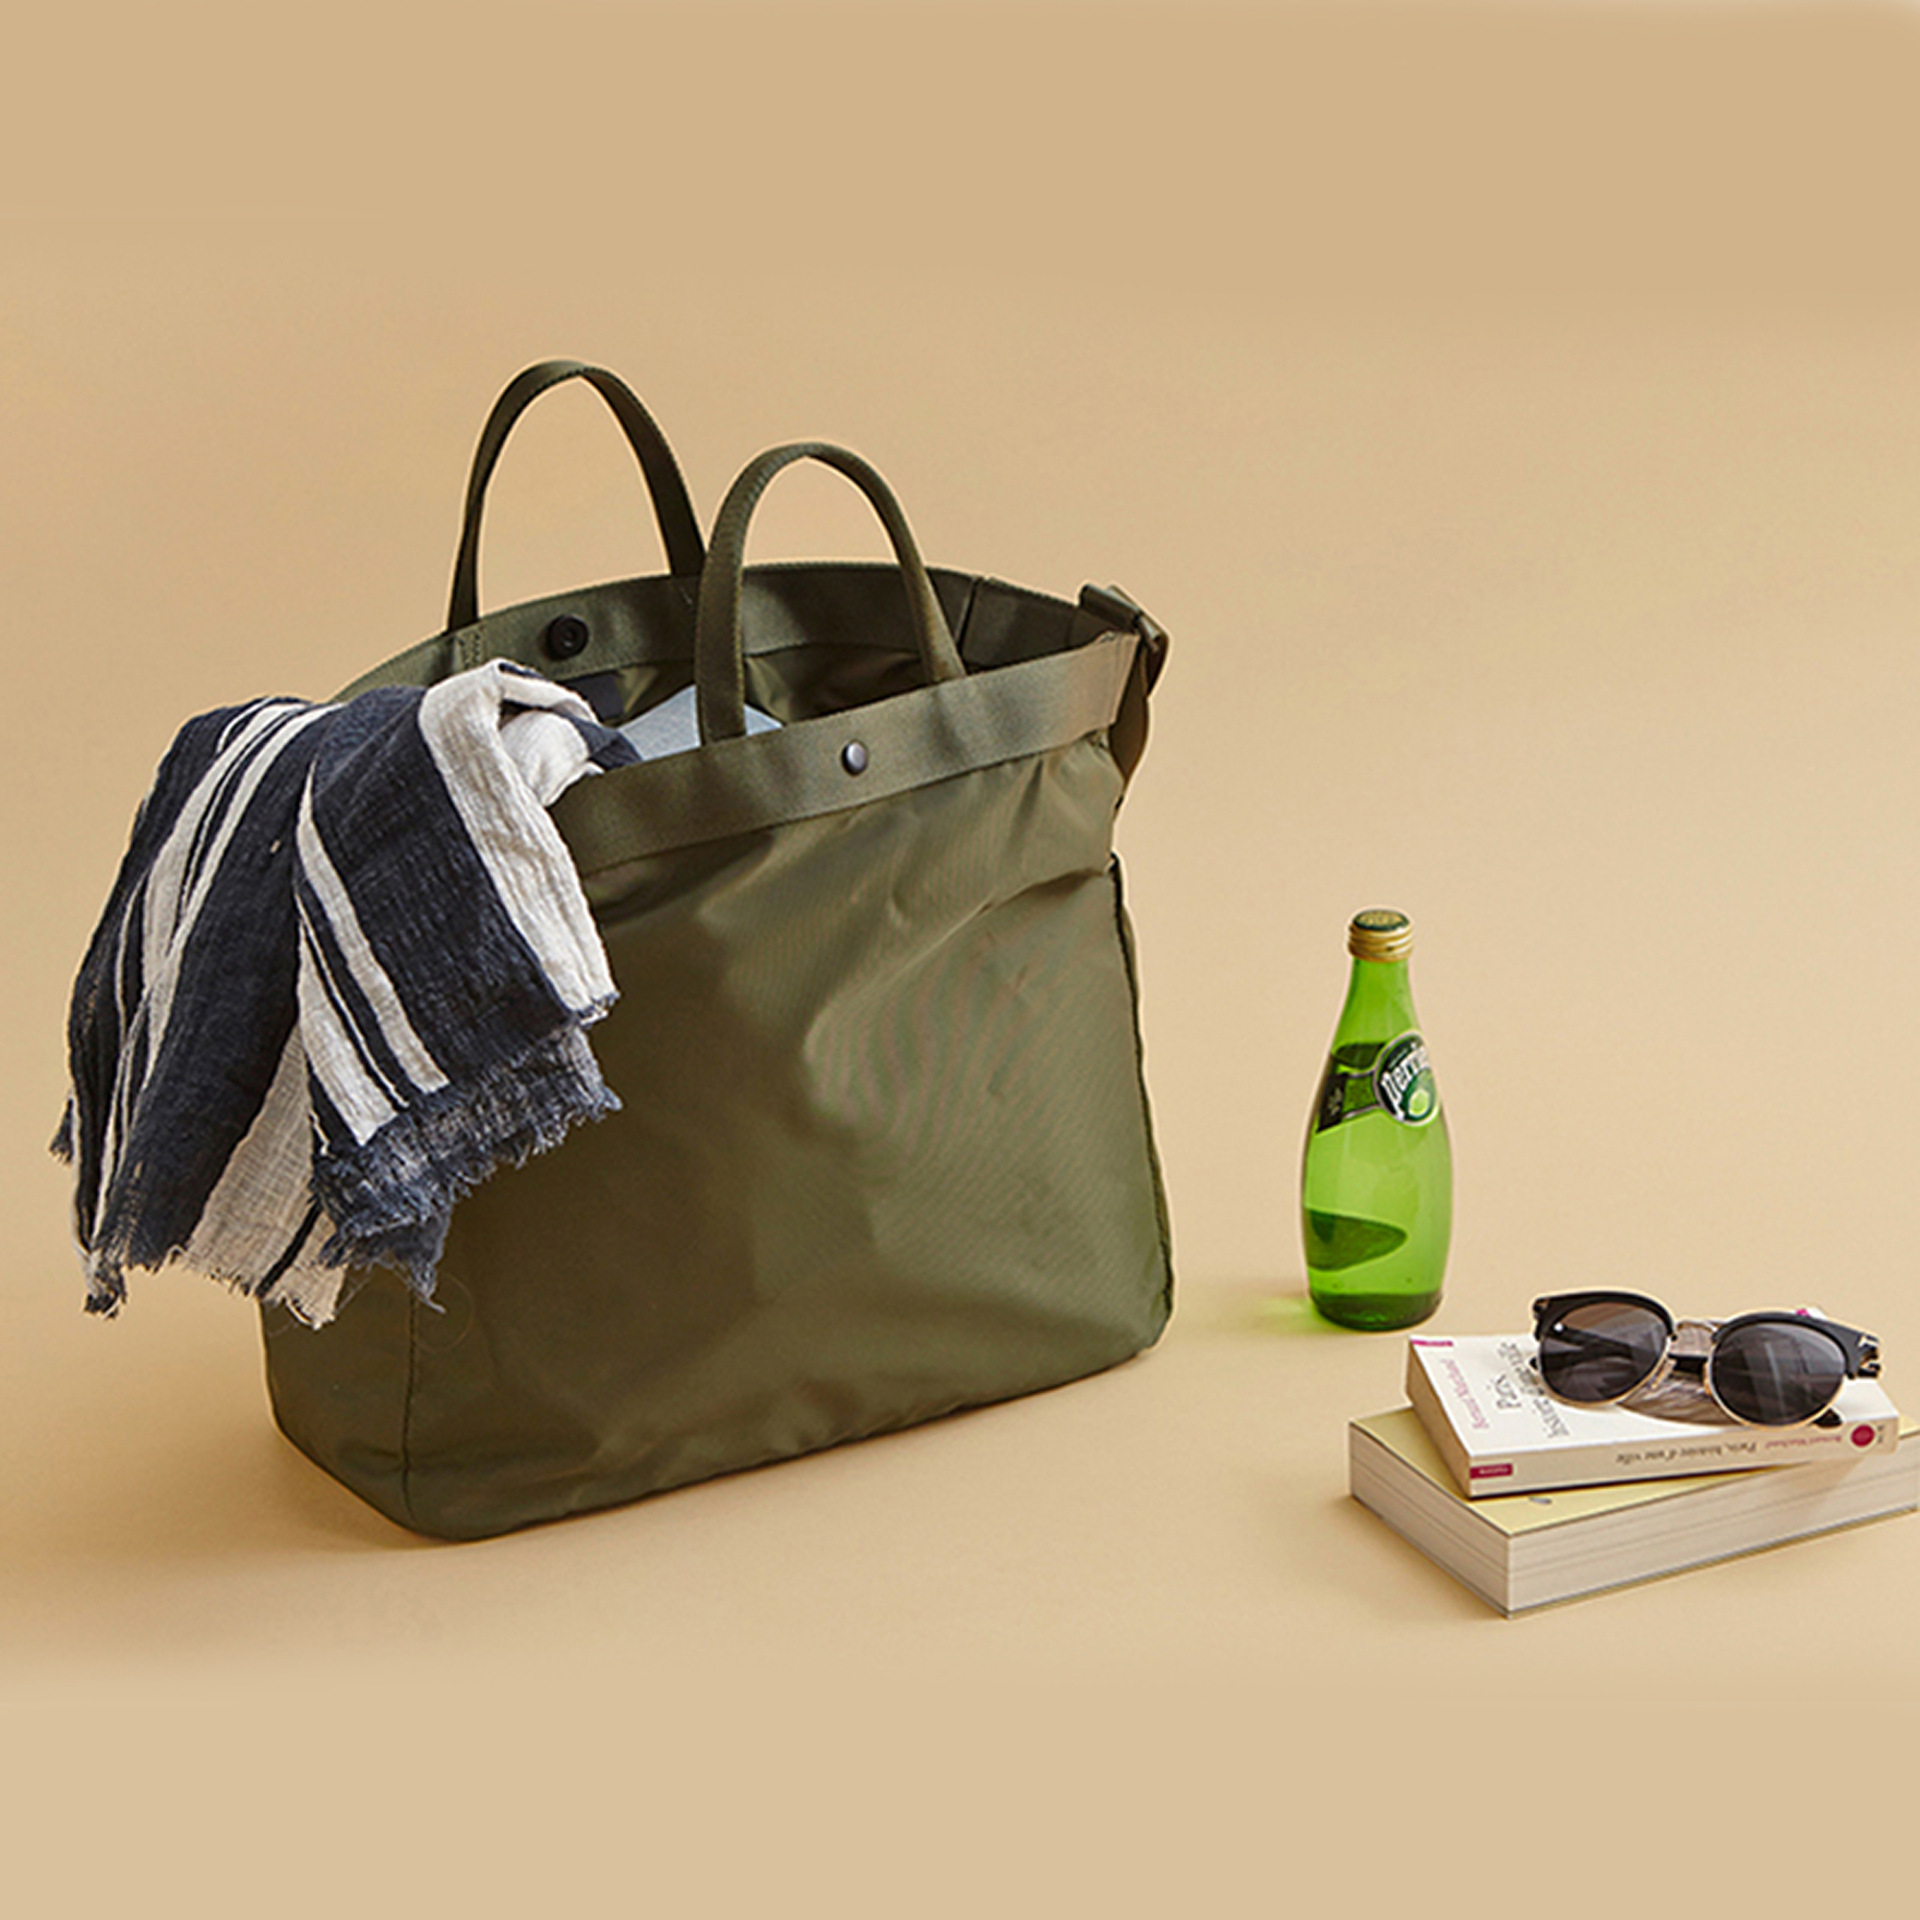 2 In 1 Waterproof Travel Bag Men Portable Duffle Bag Women Crossbody Bags Travel Organier Shoulder Bags Weekend Travel Totes